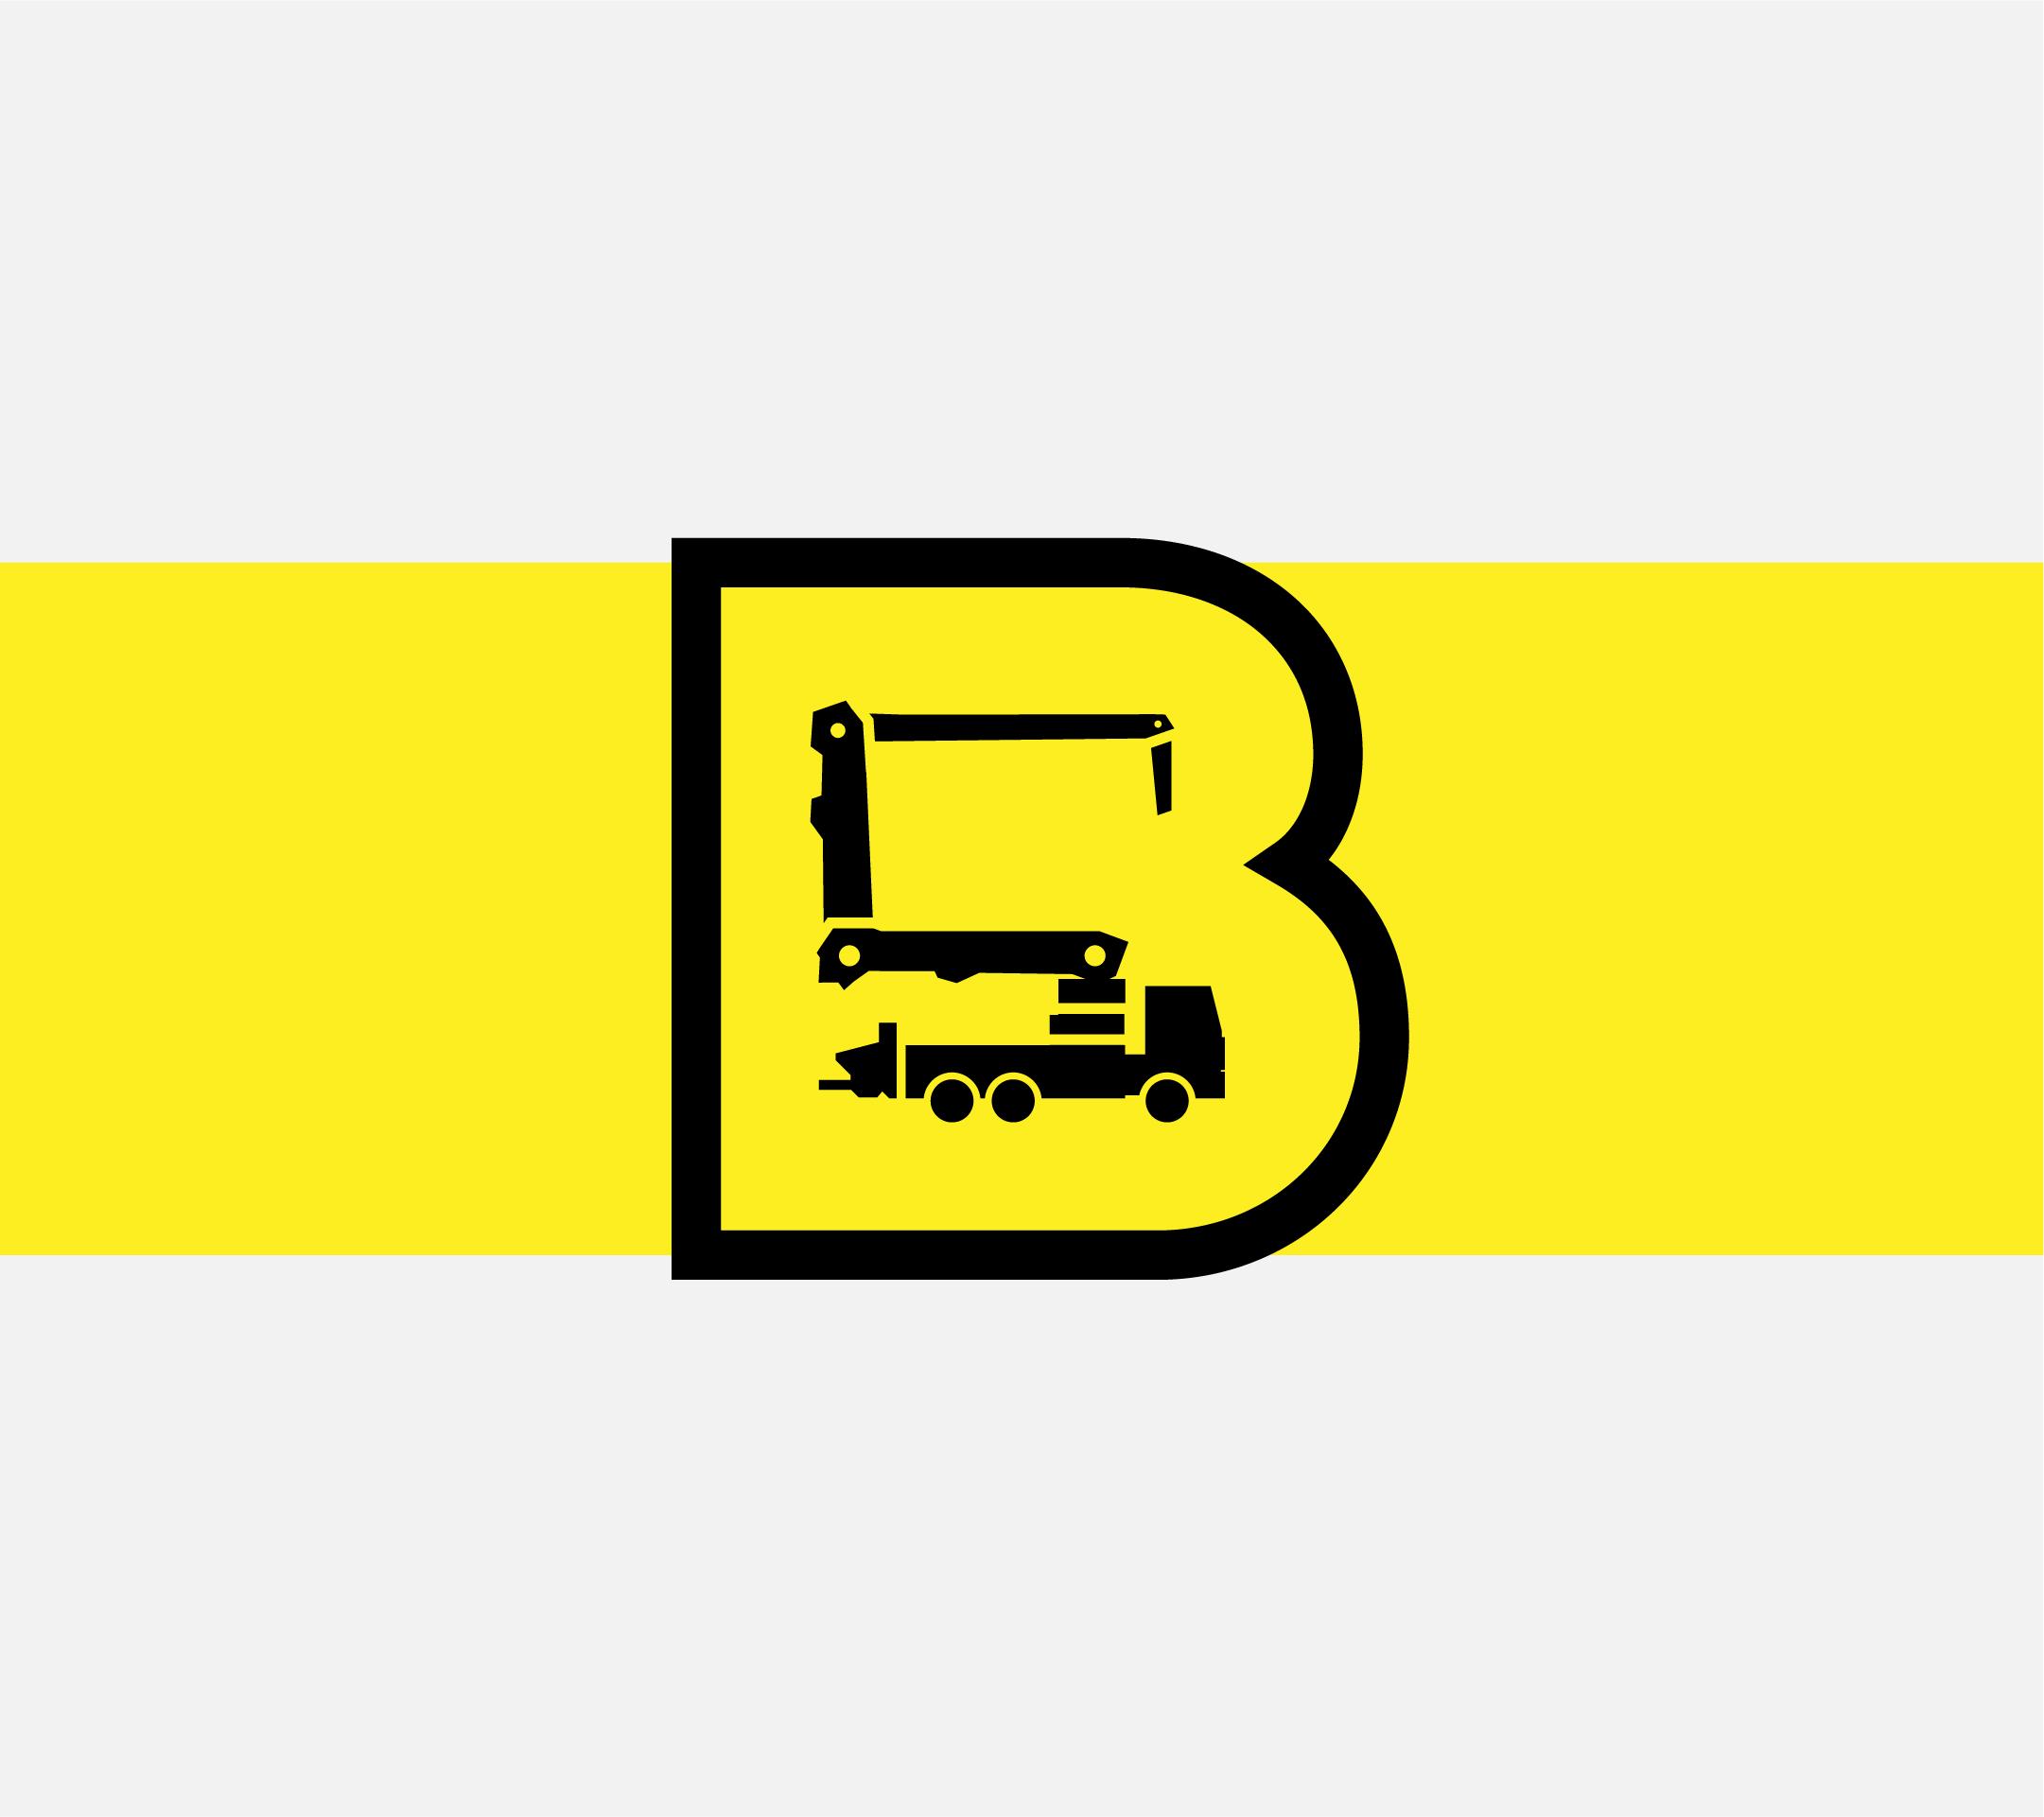 Логотип для компании по аренде спец.техники фото f_277599952f9ca0d0.jpg